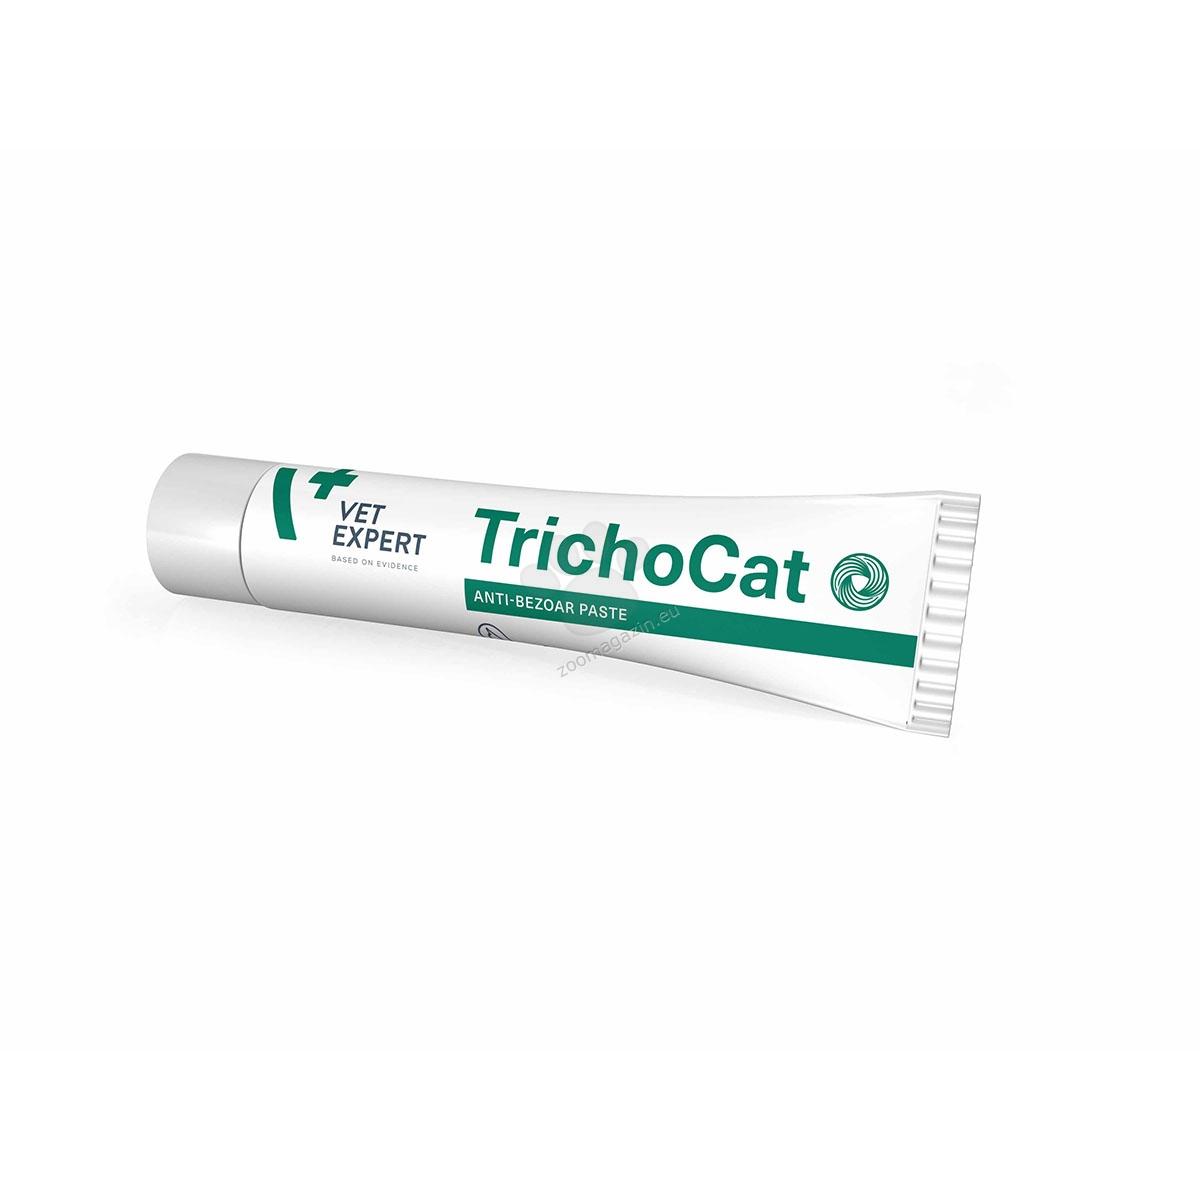 Vetexpert - TrichoCat - антибезоарна паста 50 гр.